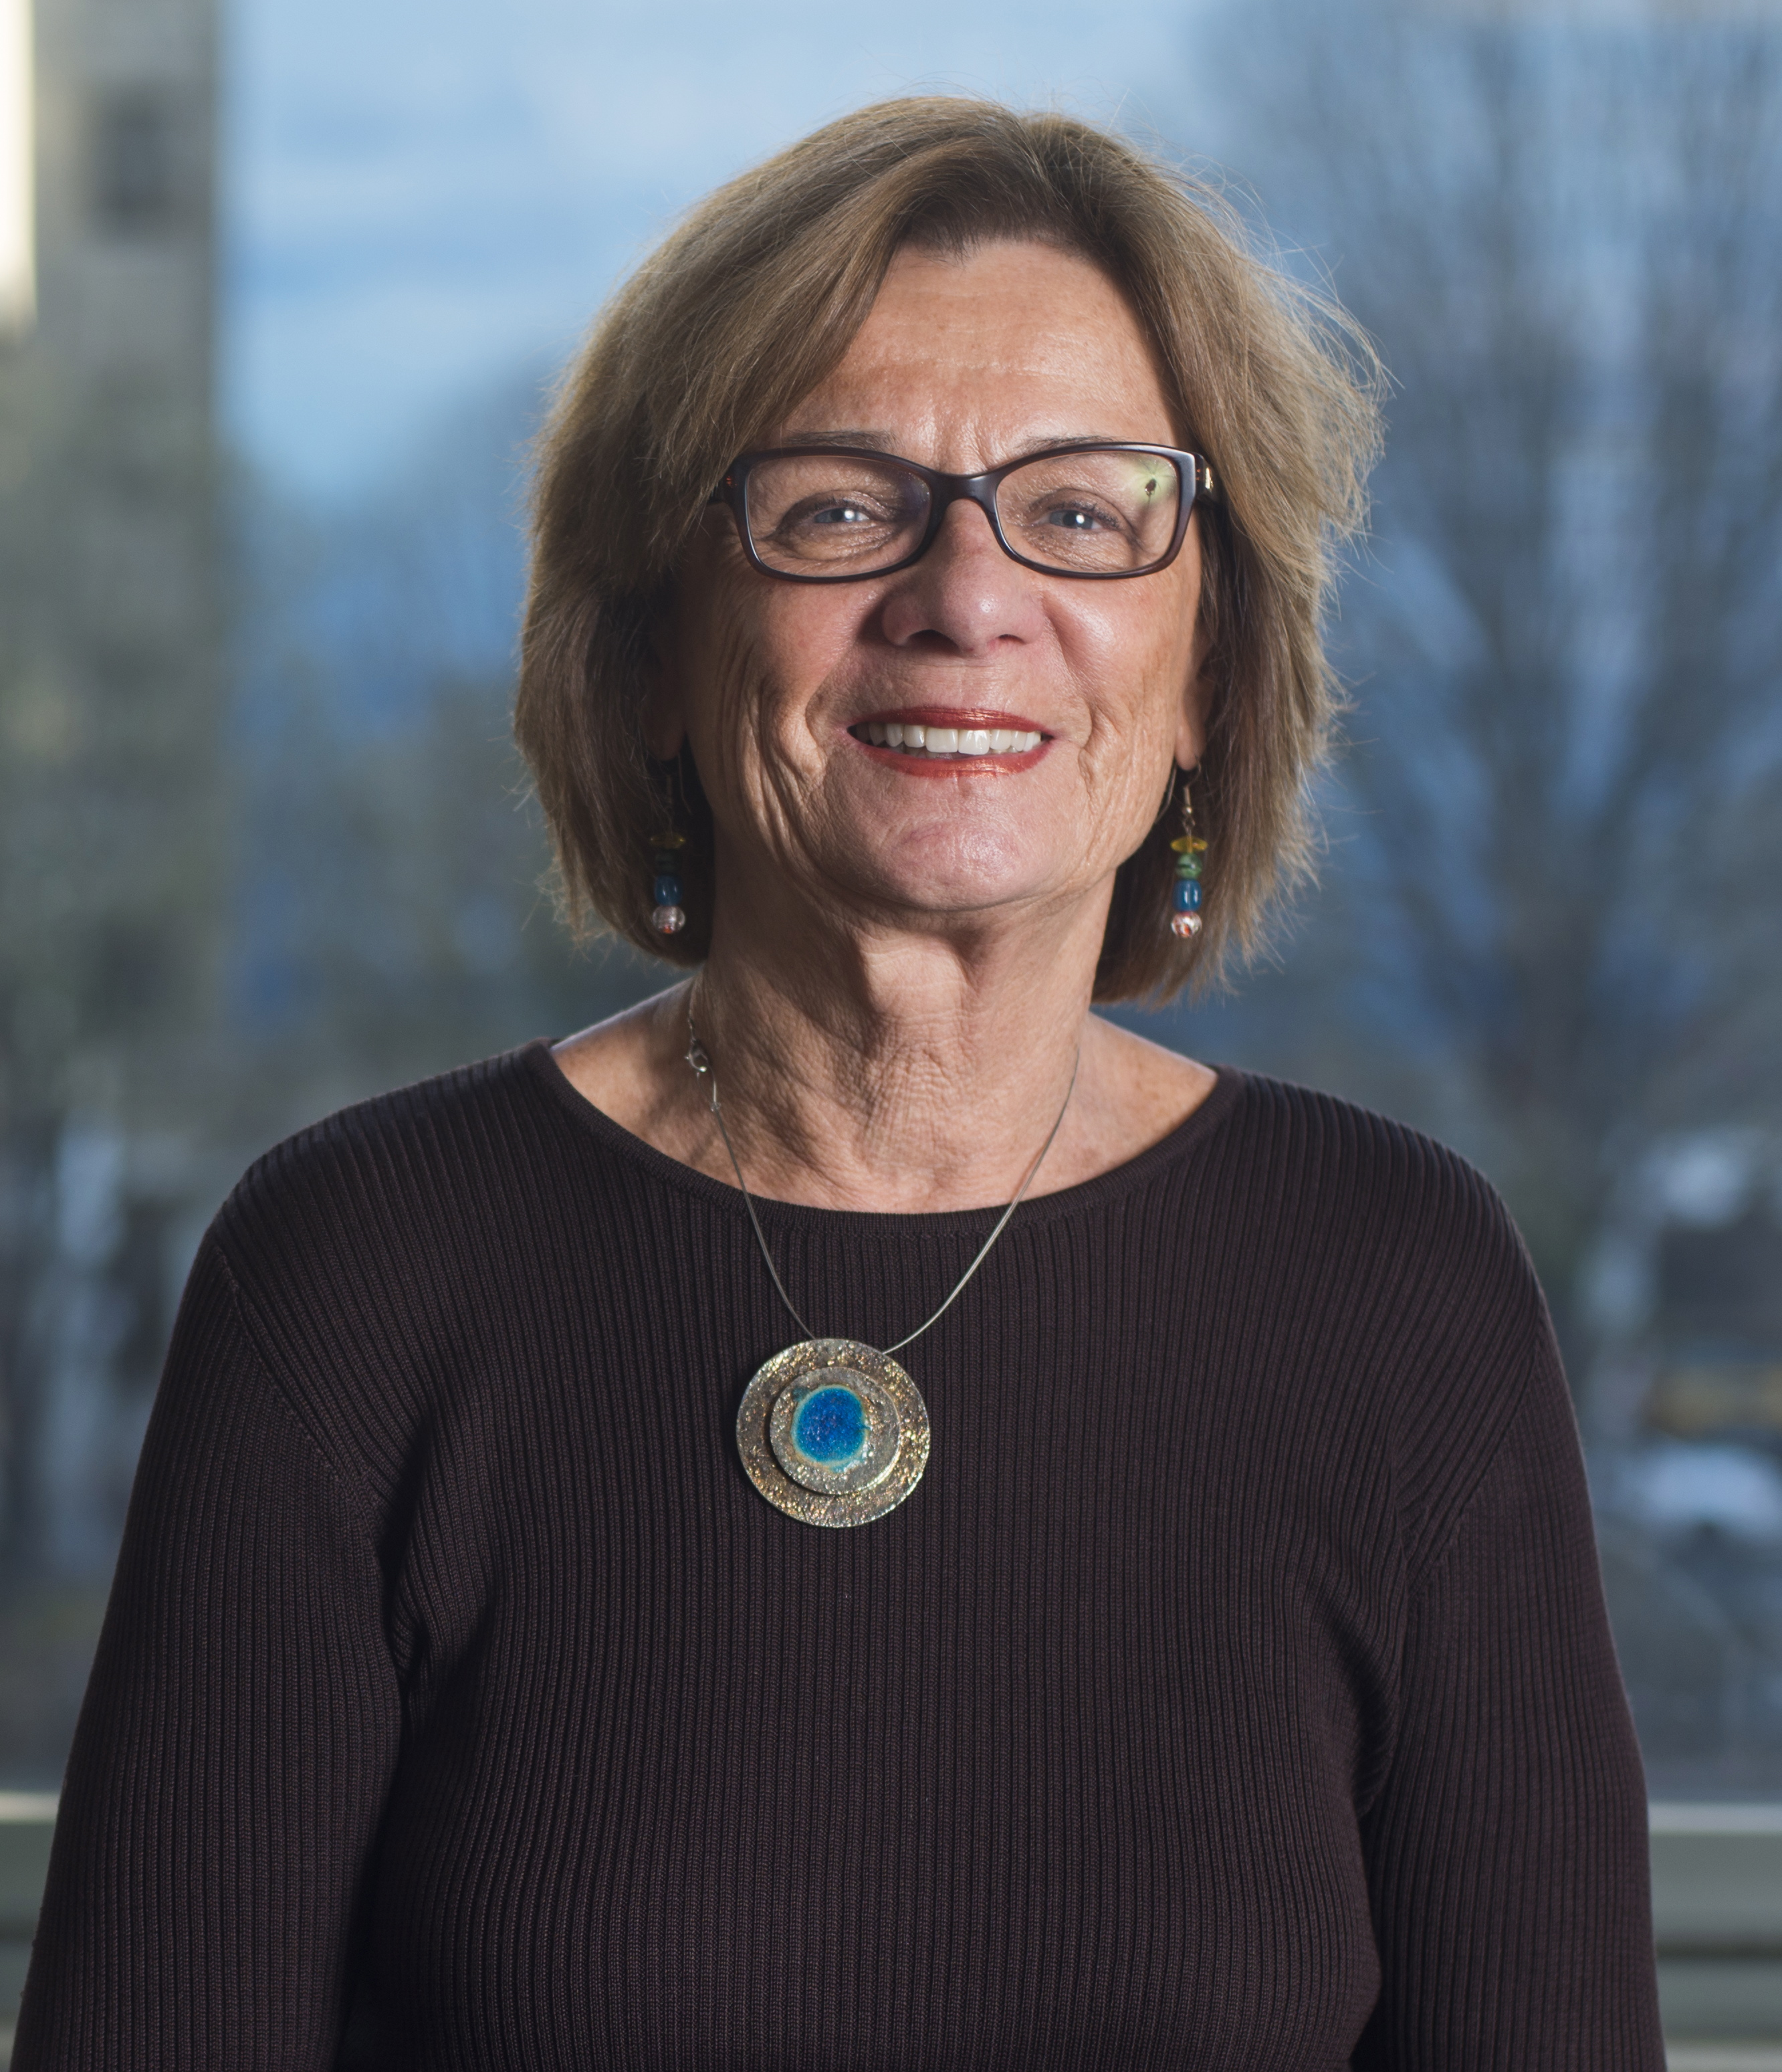 Dr. Christine Coughlin